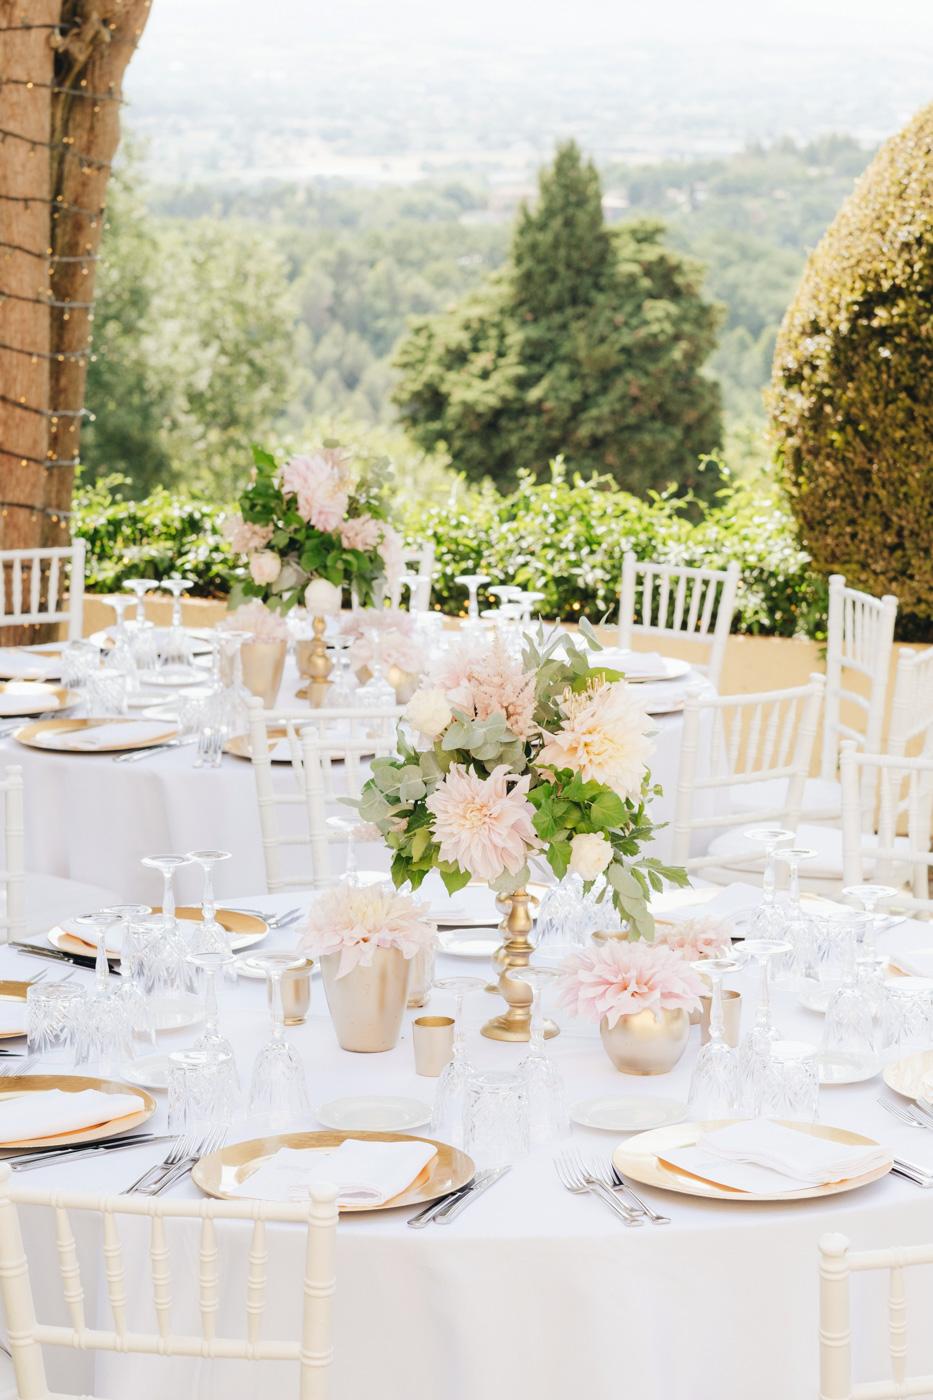 Matrimoni all'italiana wedding photographer italy-11.jpg